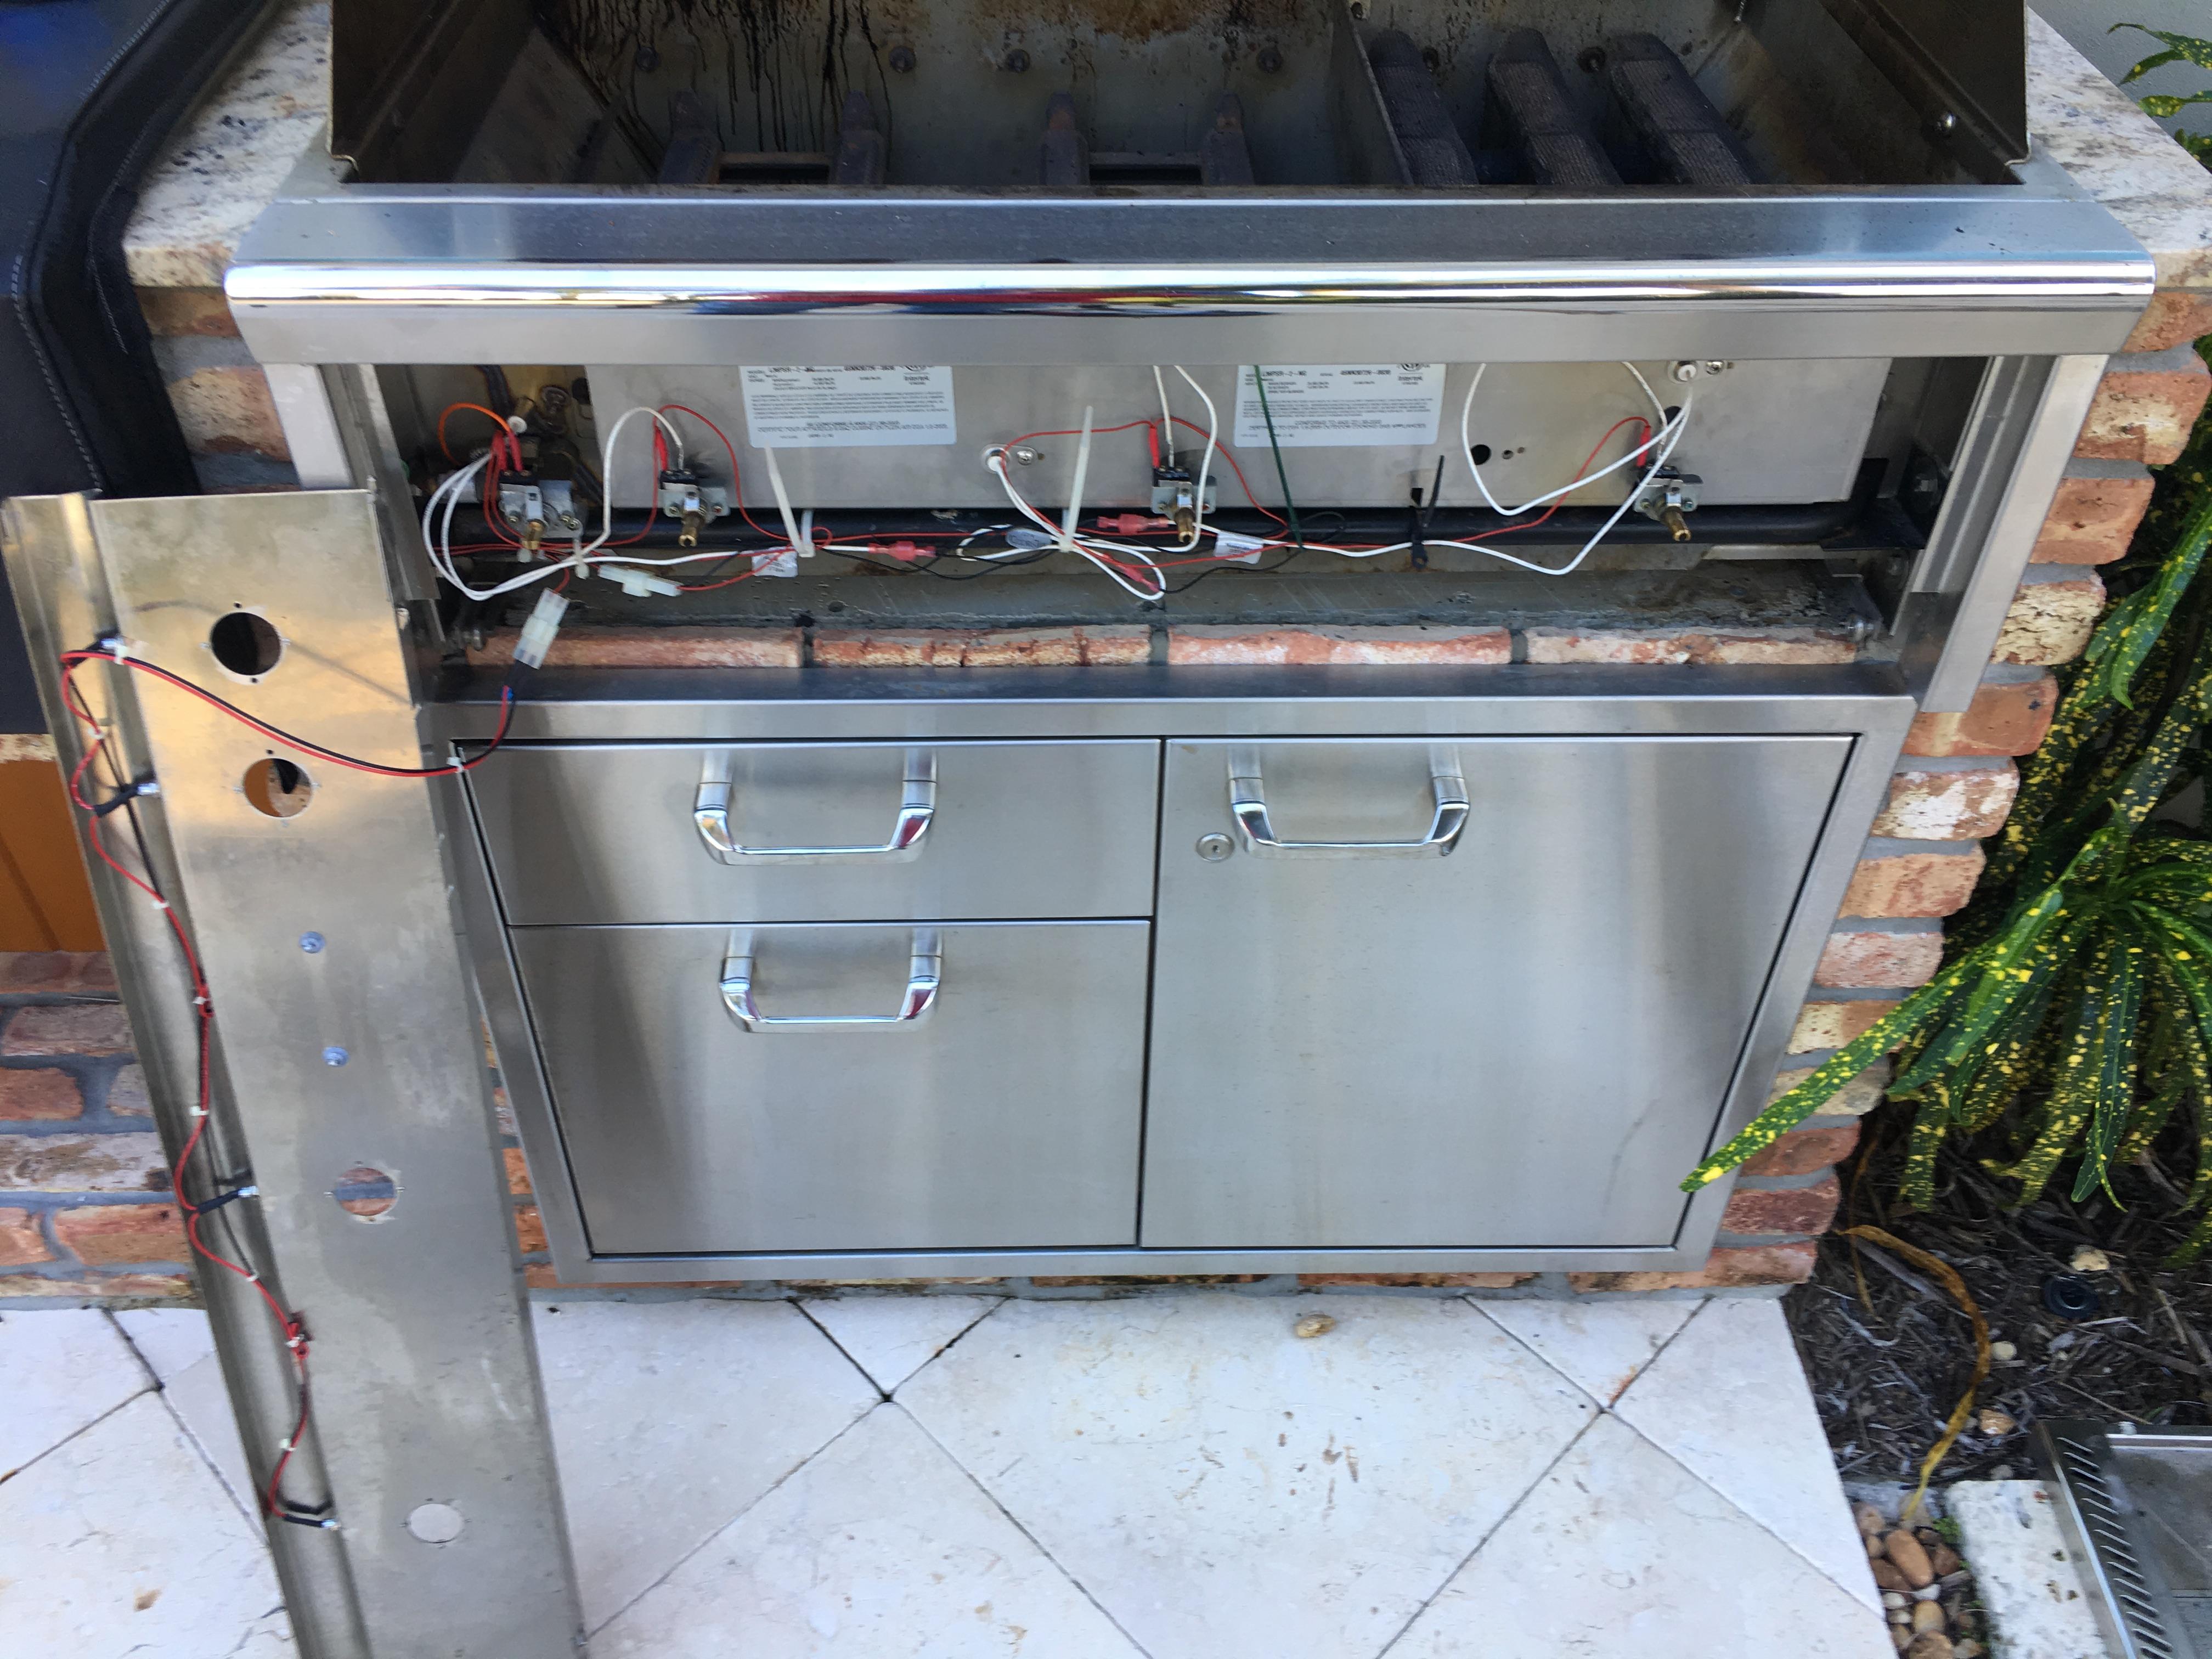 lynx valve microswitch repair 4?t=1510956915 lynx valve microswitch repair 4 jpg?t=1510956915 Lynx Cat at metegol.co